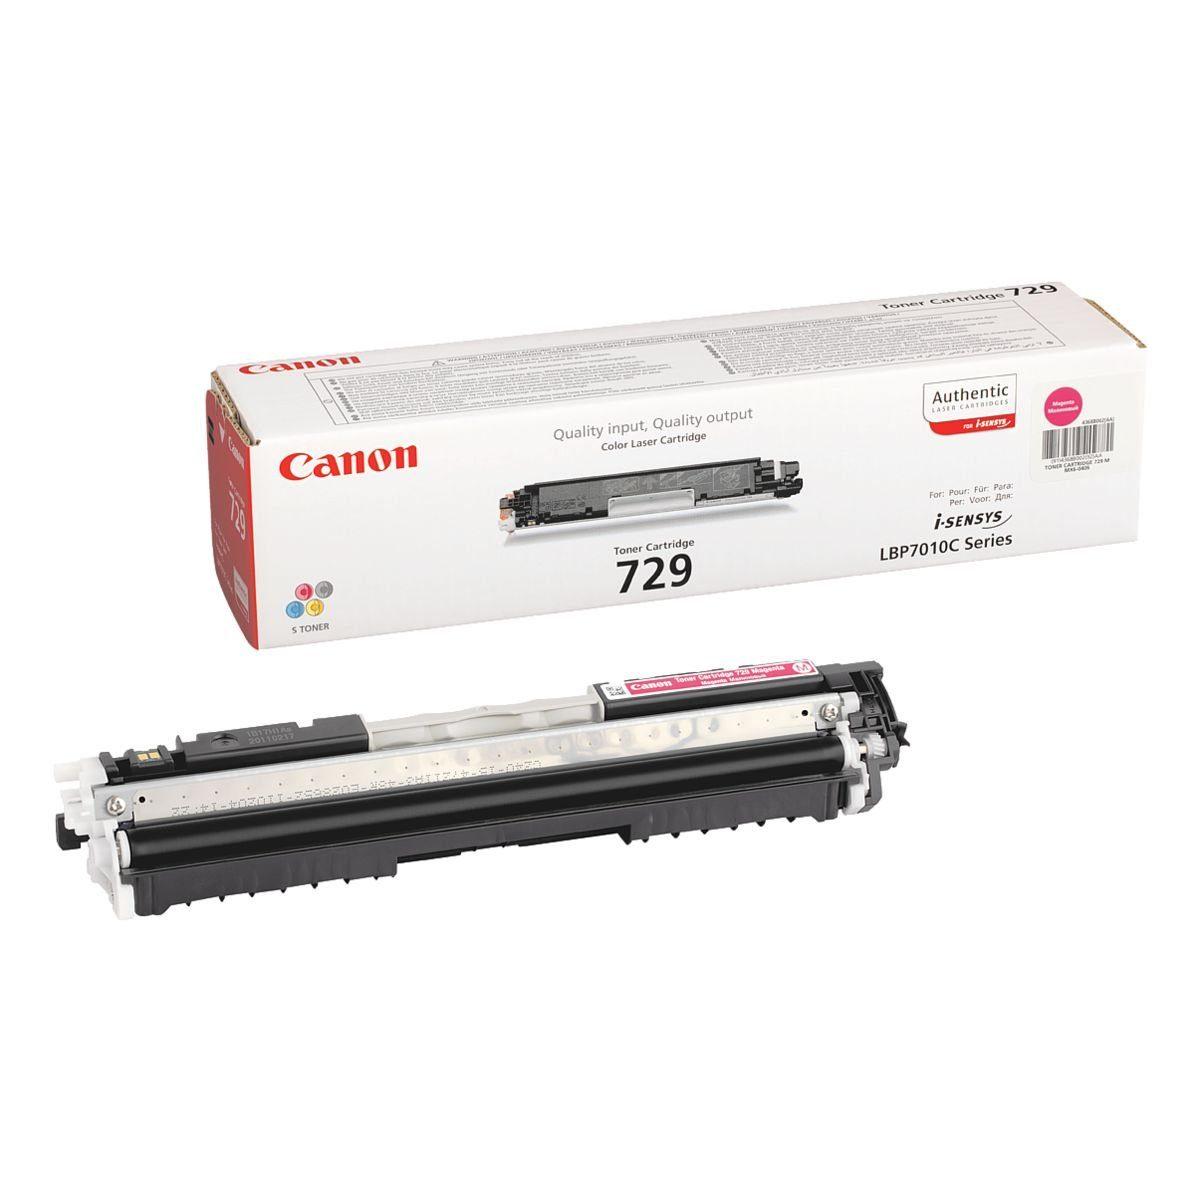 Canon Tonerpatrone »729«